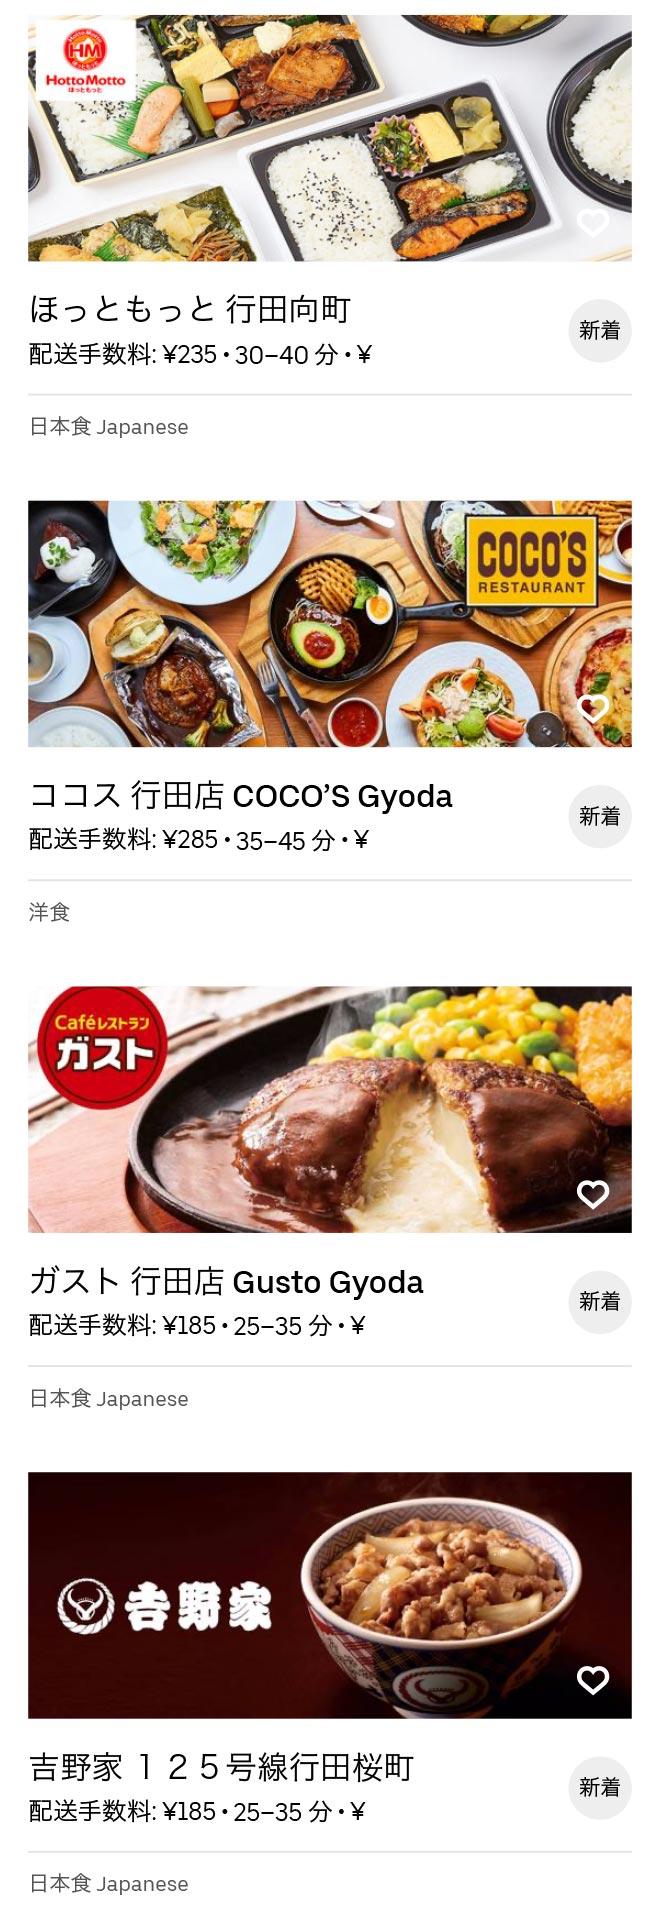 Gyoda menu 2010 1